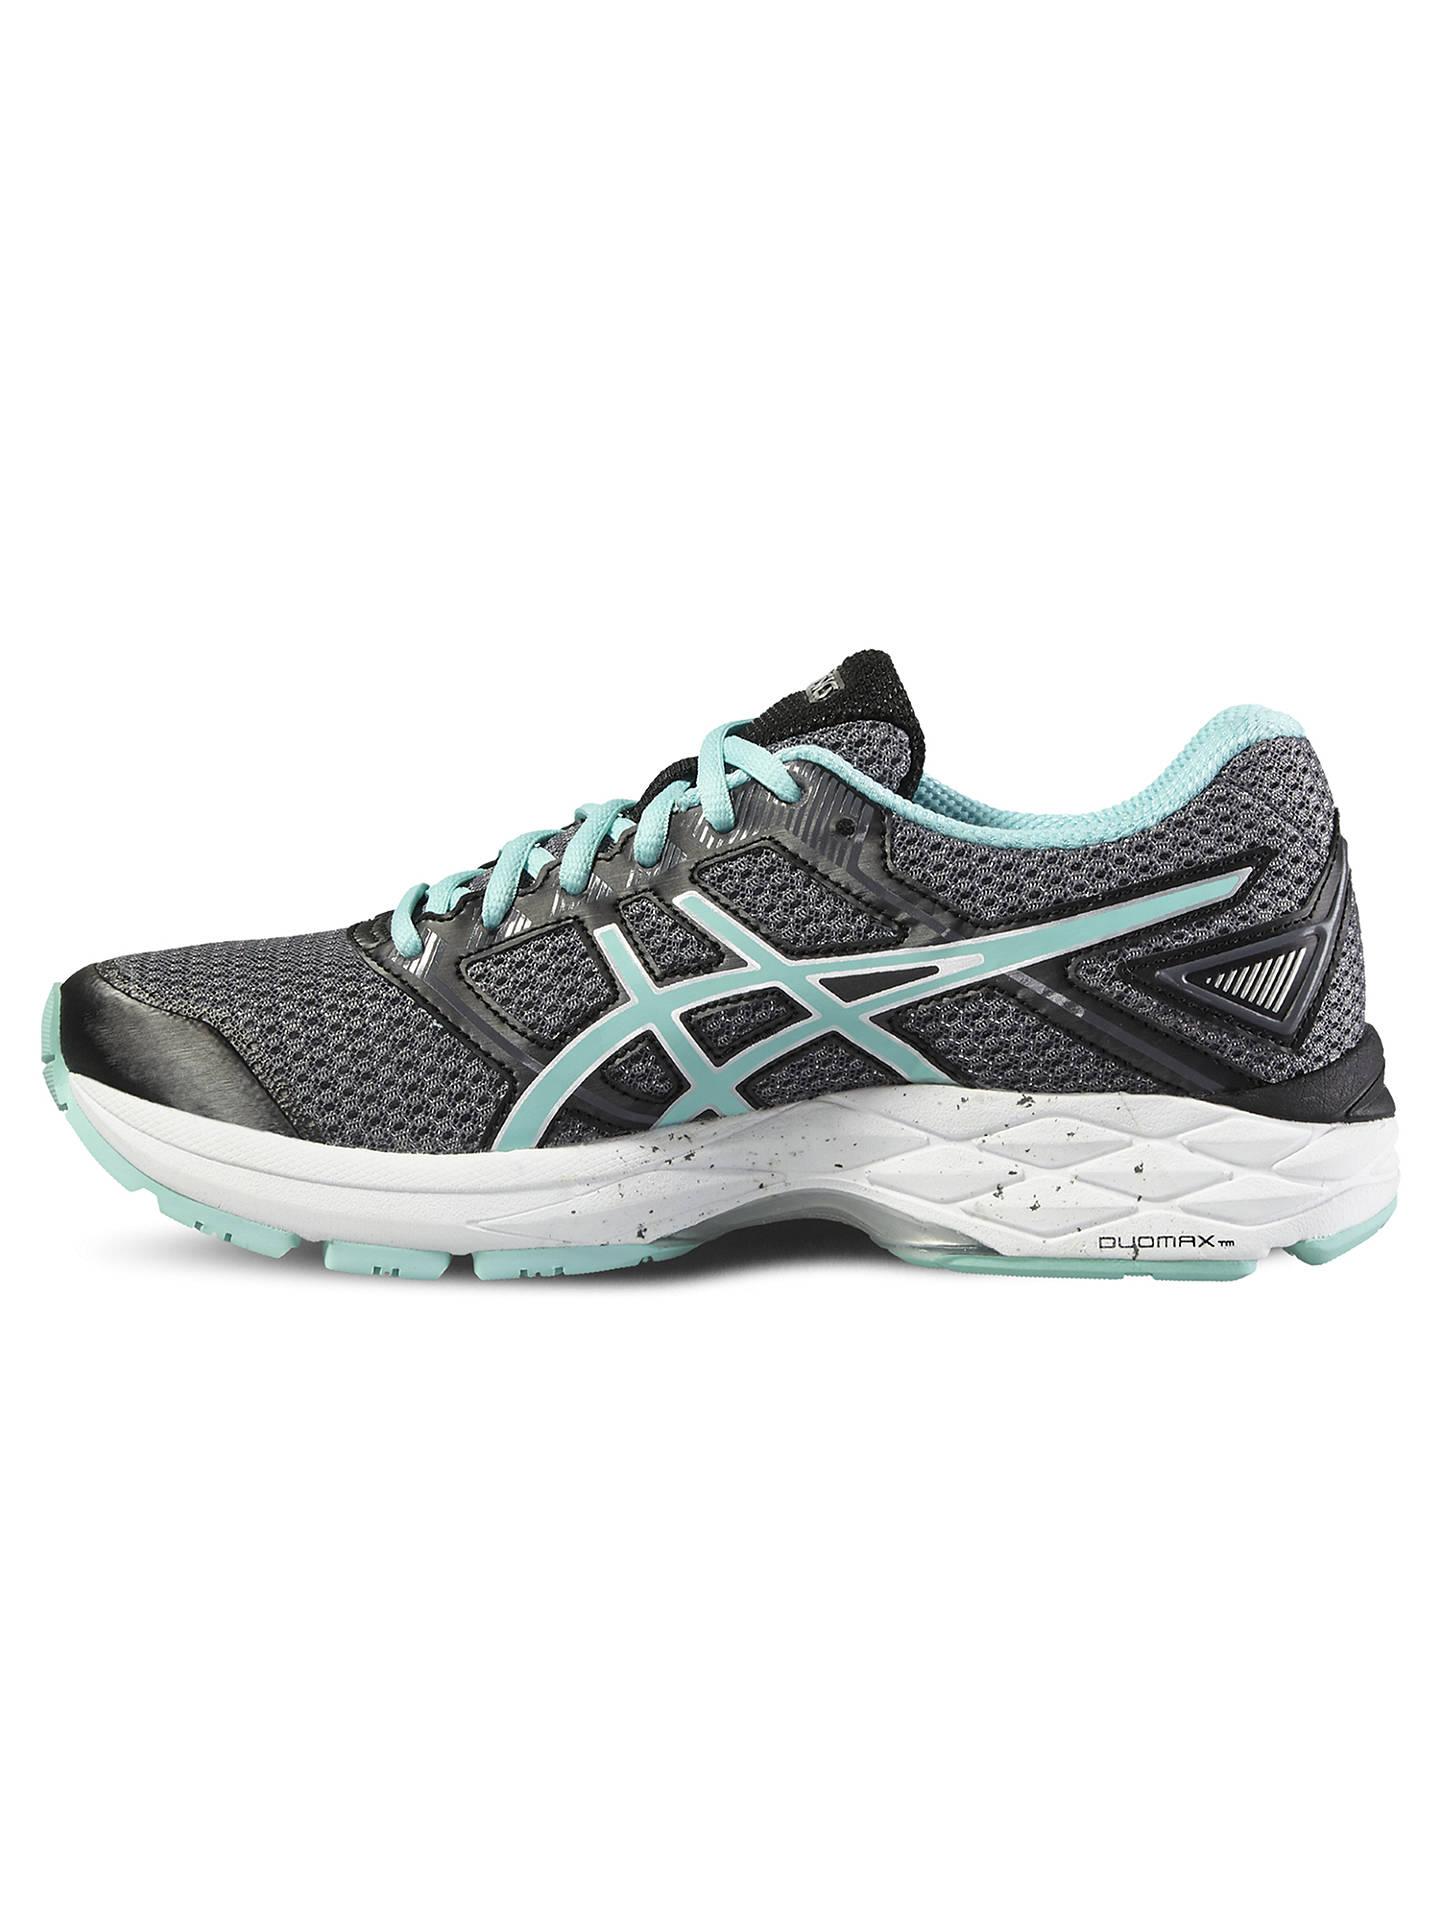 e568c8c747 Buy Asics GEL-PHOENIX 8 Women's Running Shoes, Black/Blue, 4 Online ...